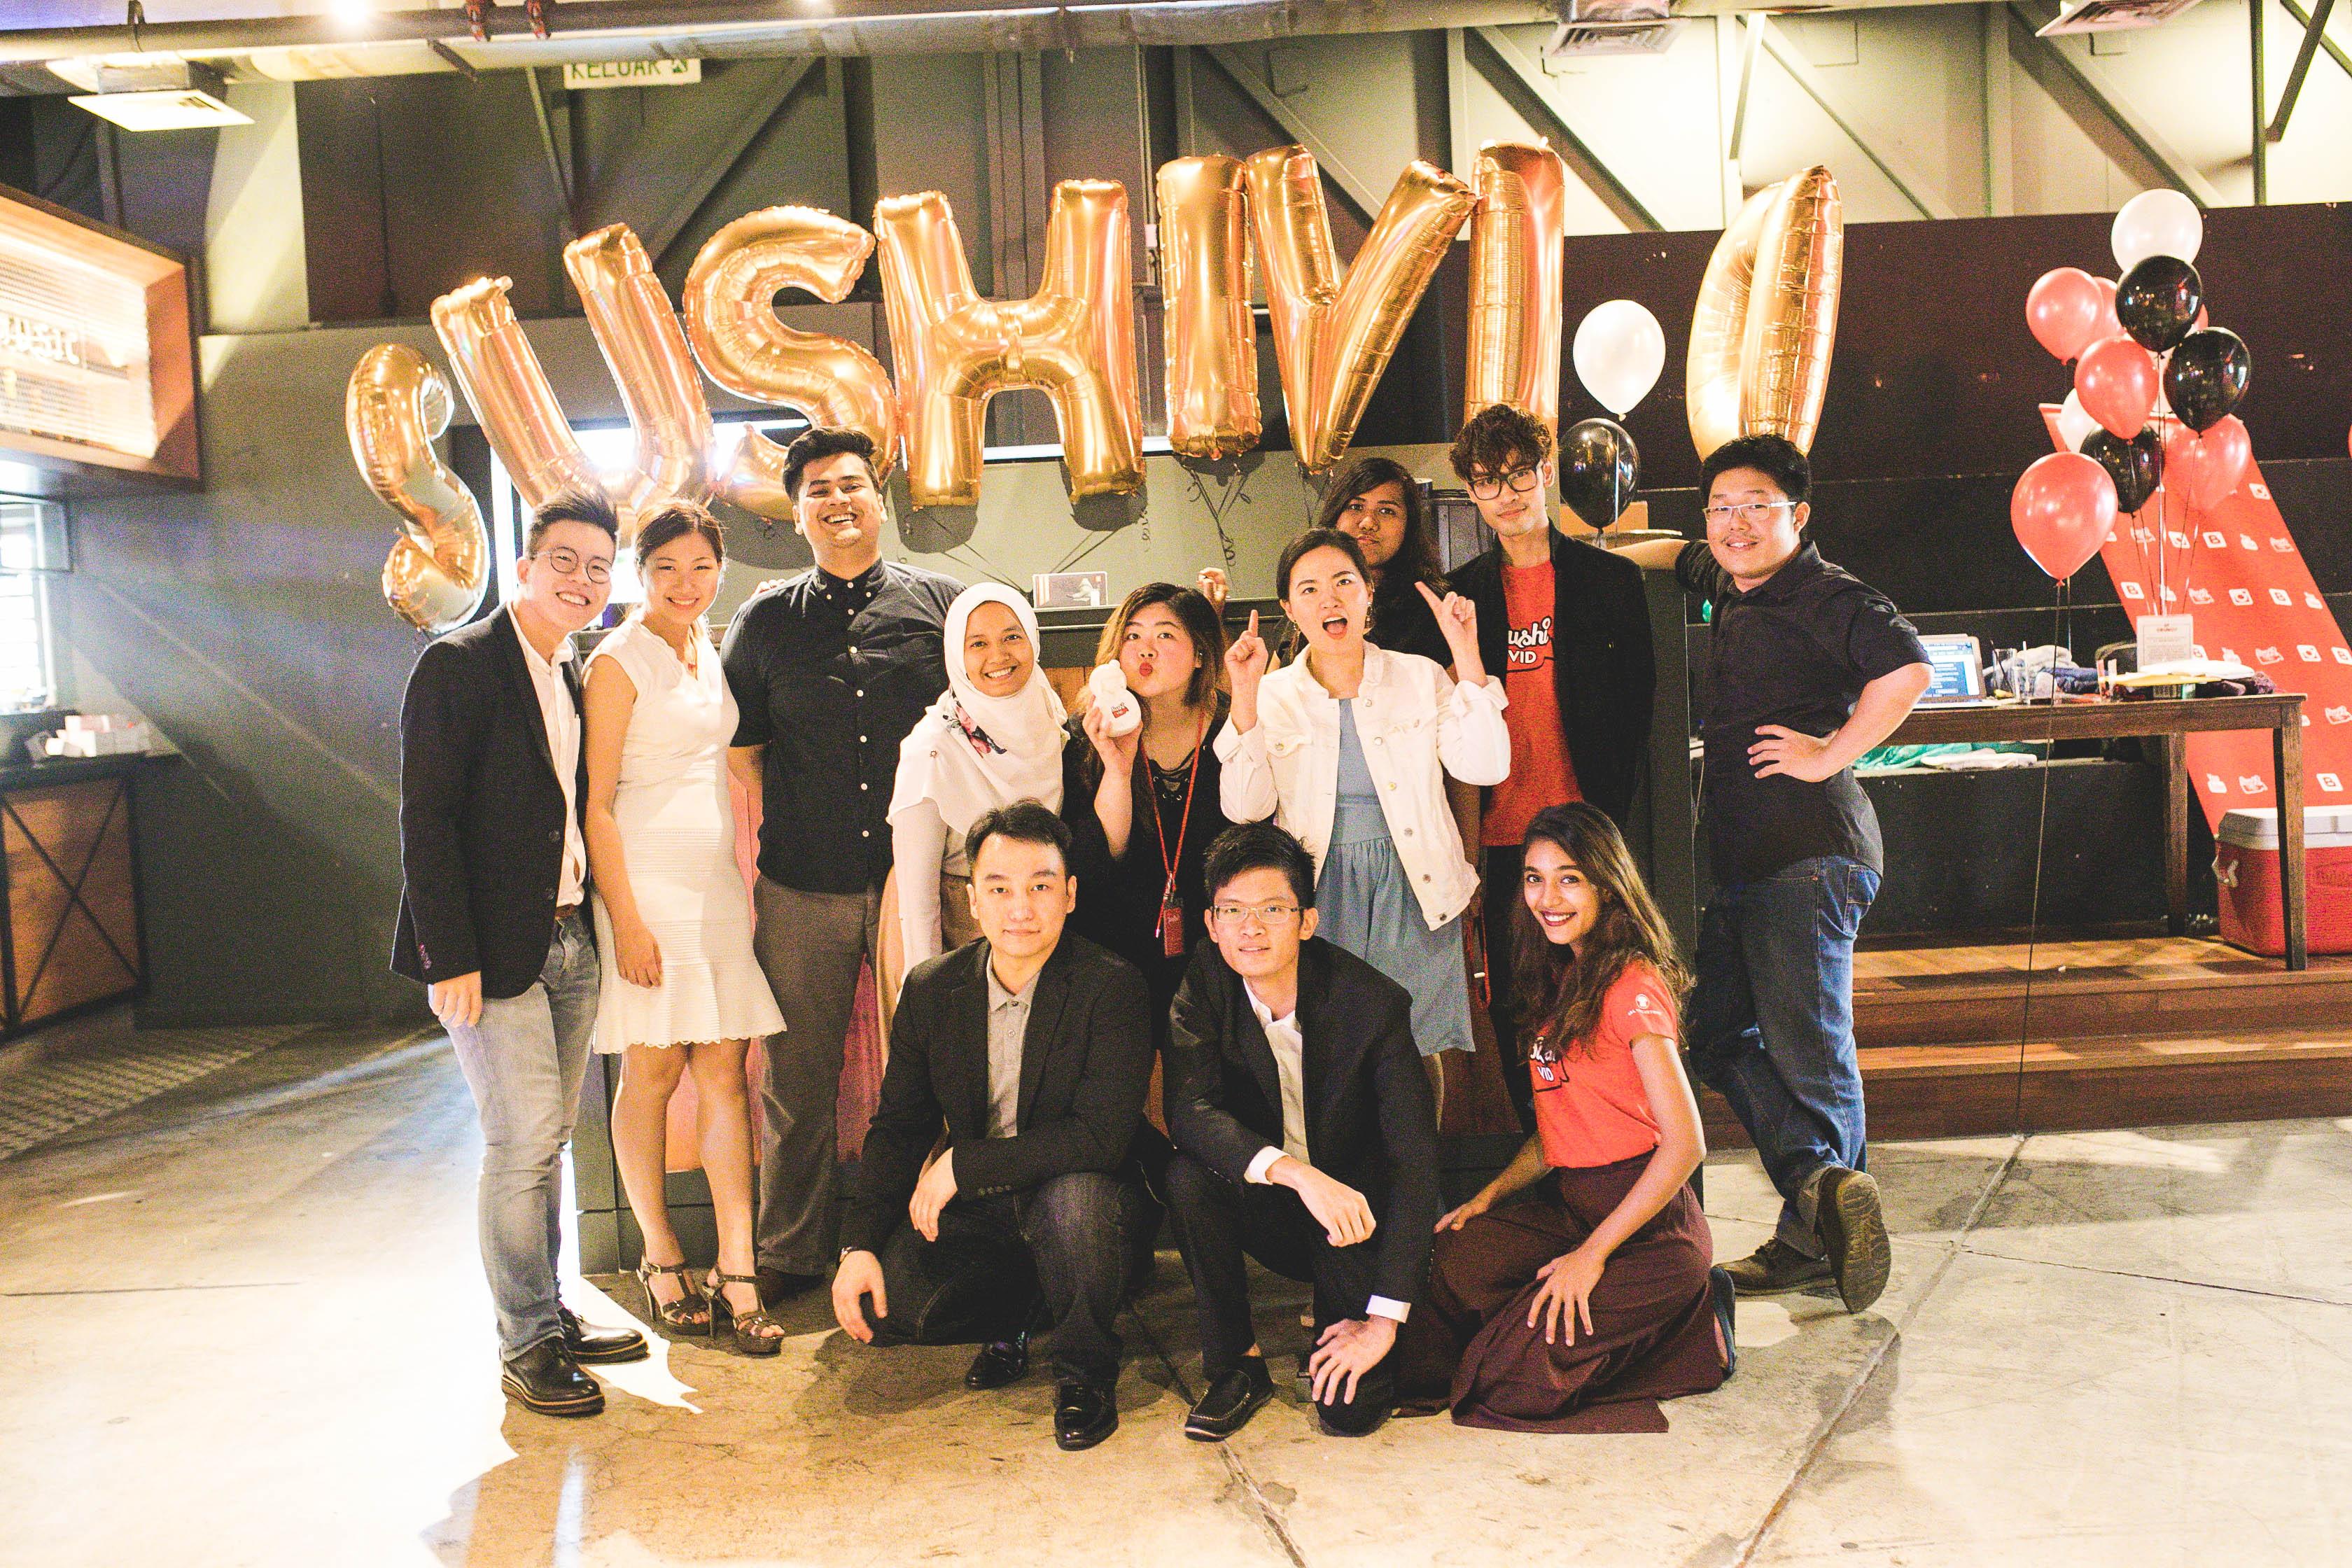 Sushivid+crunch+233